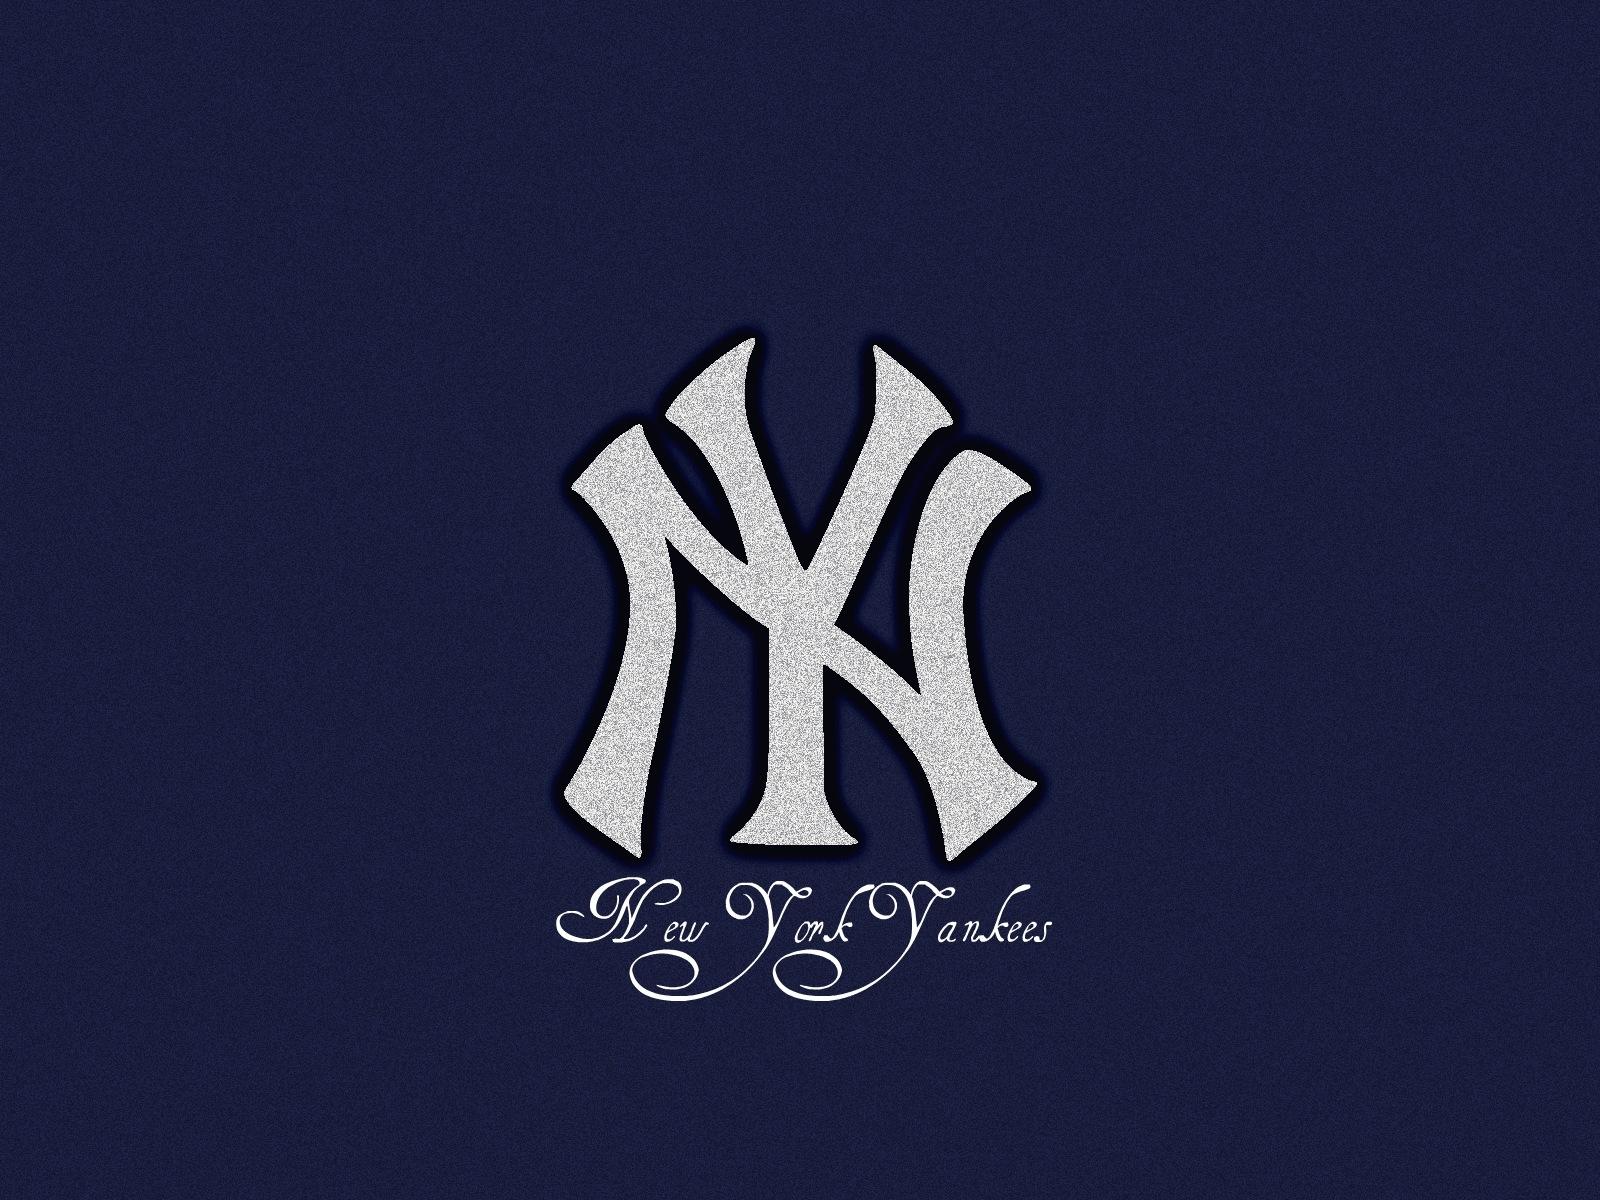 new york yankees wallpapers hd download